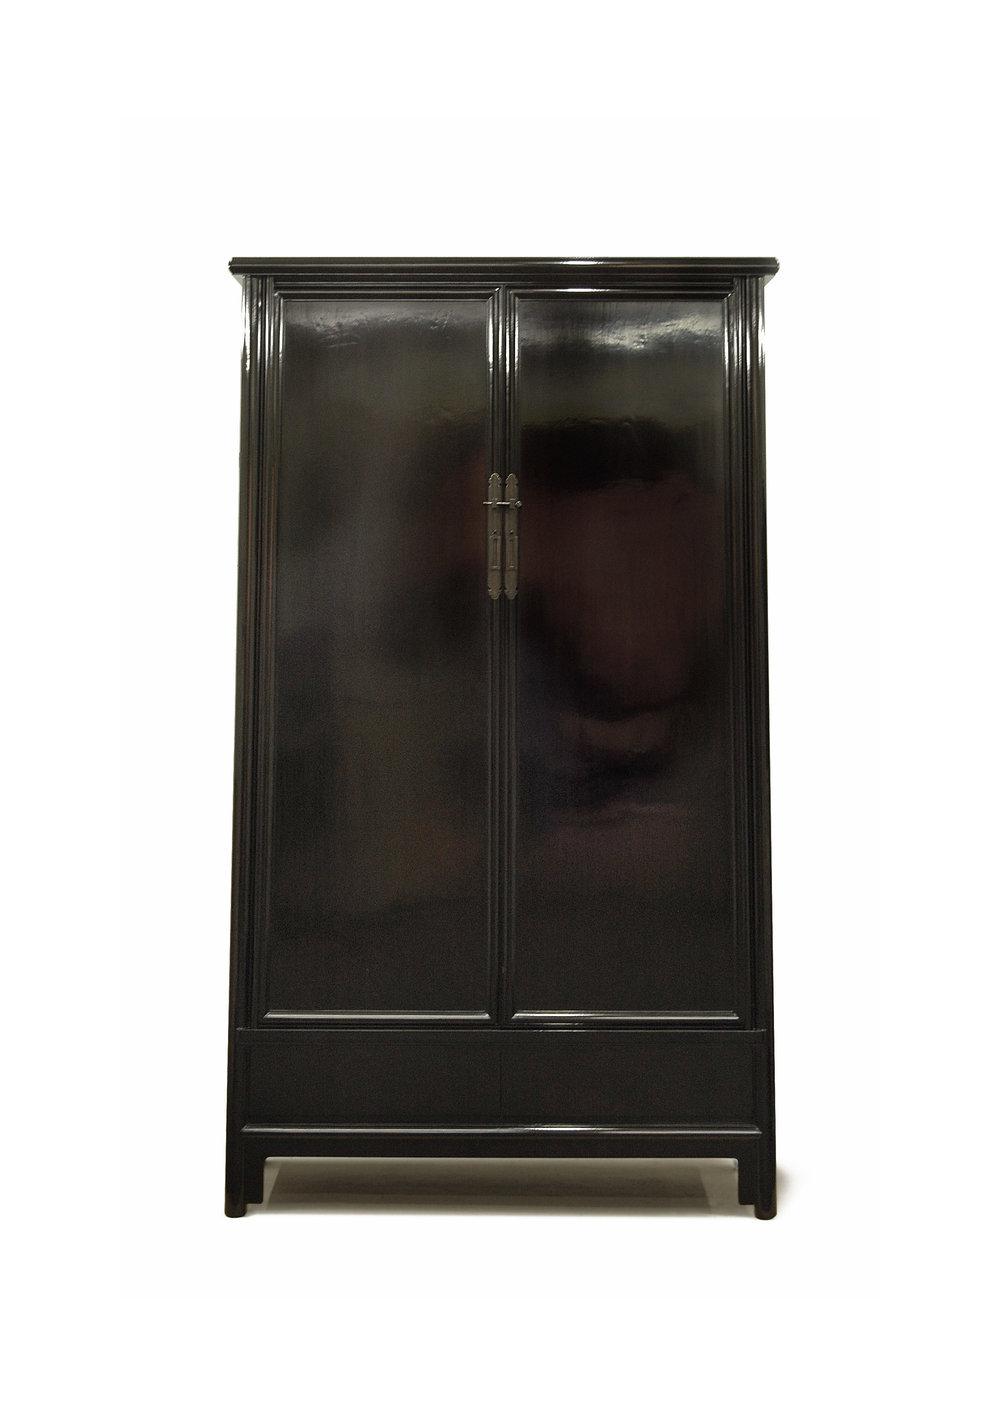 ....bespoke furniture | rosewood london : big armoire..特别定制家具 | 瑰丽伦敦酒店:大柜....